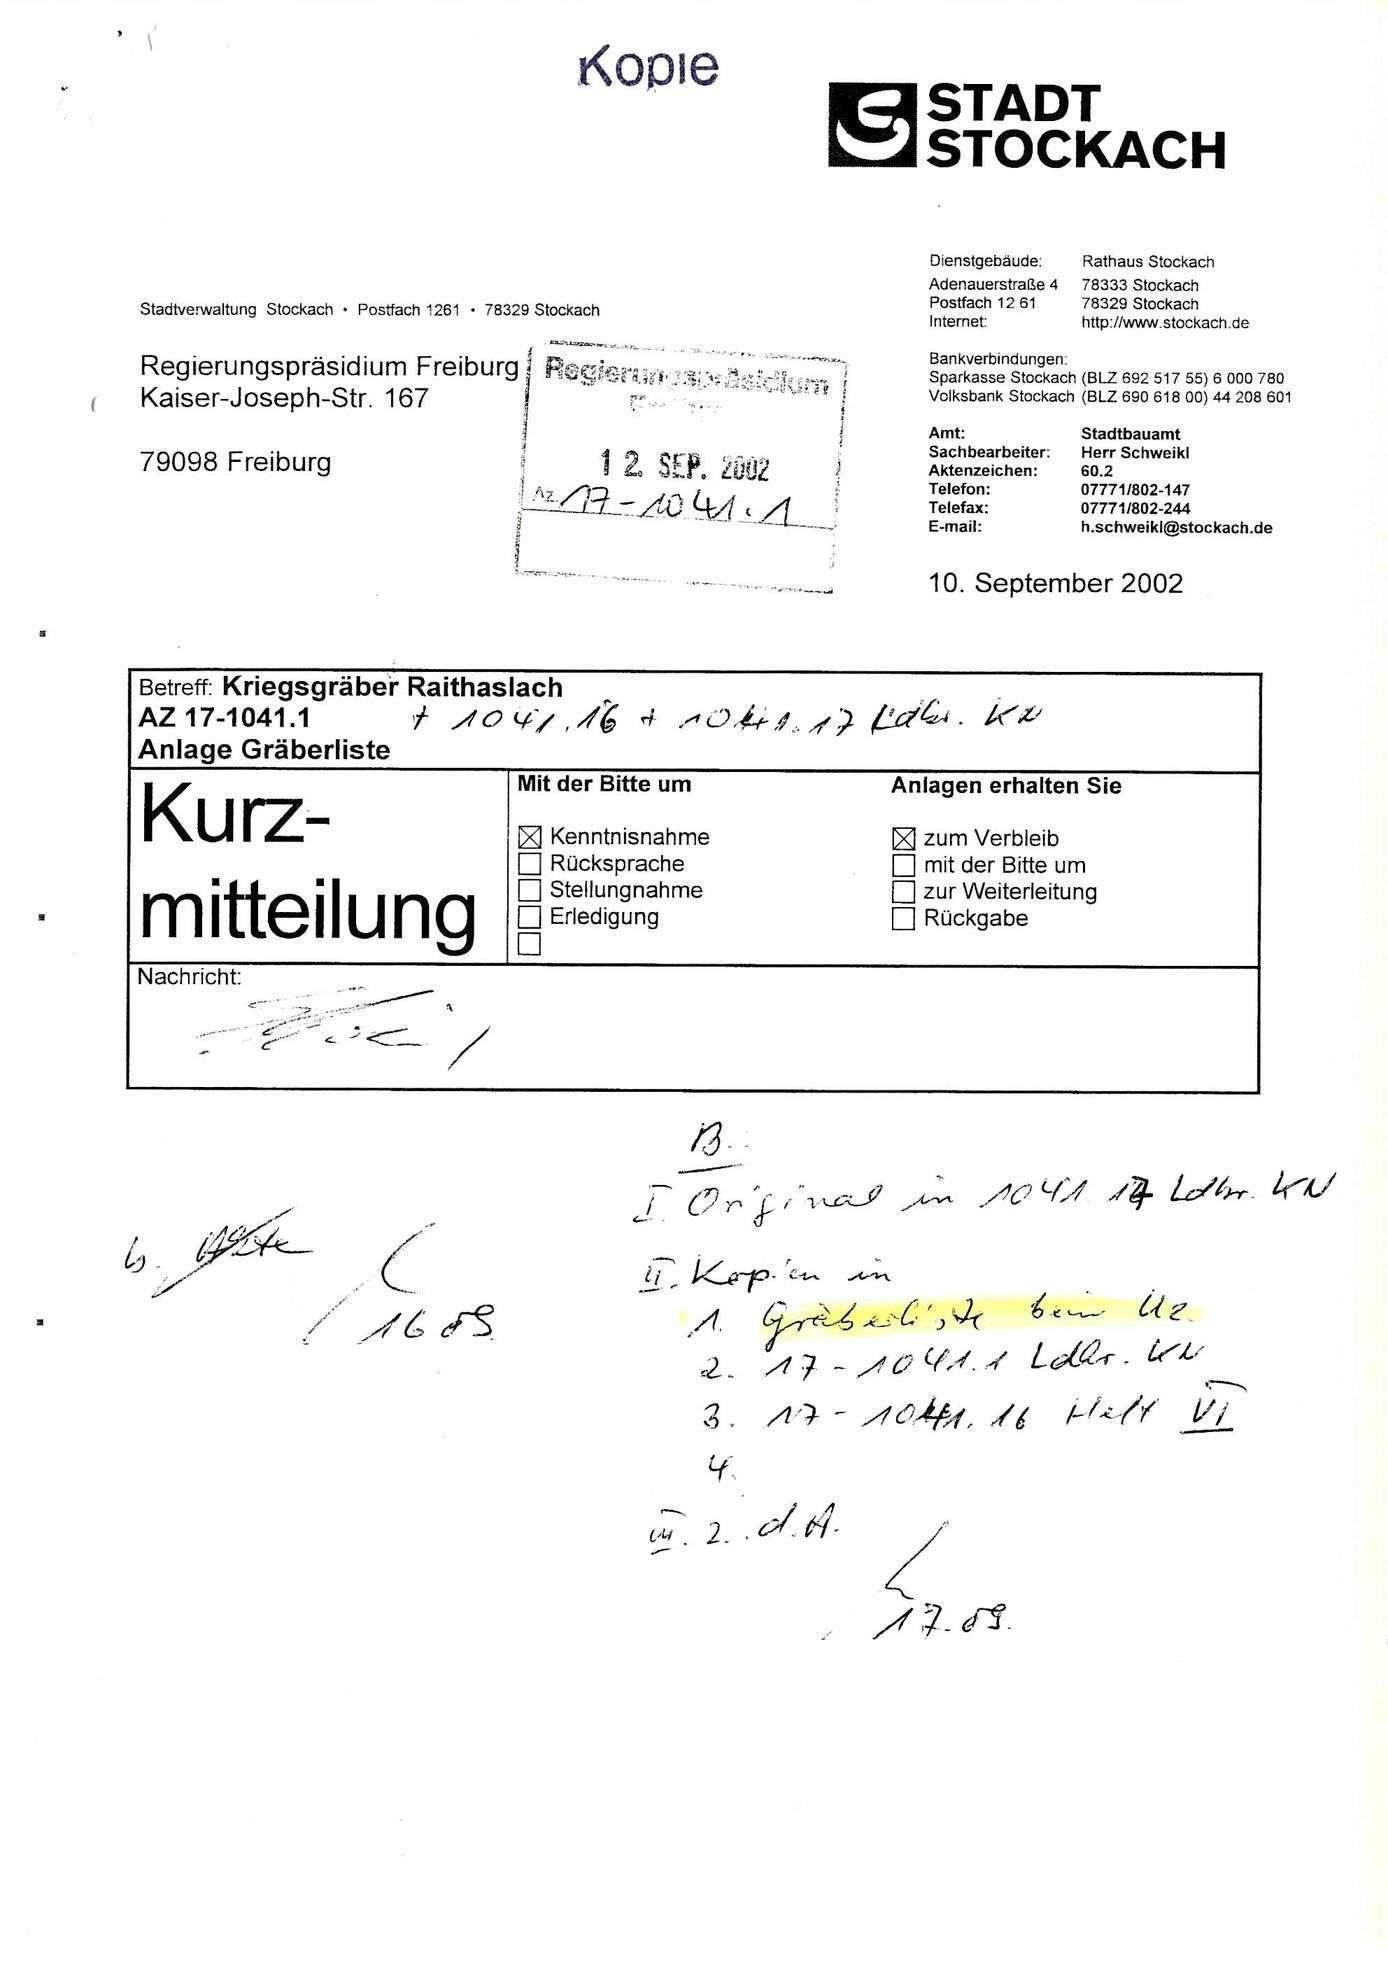 Raithaslach, Bild 1